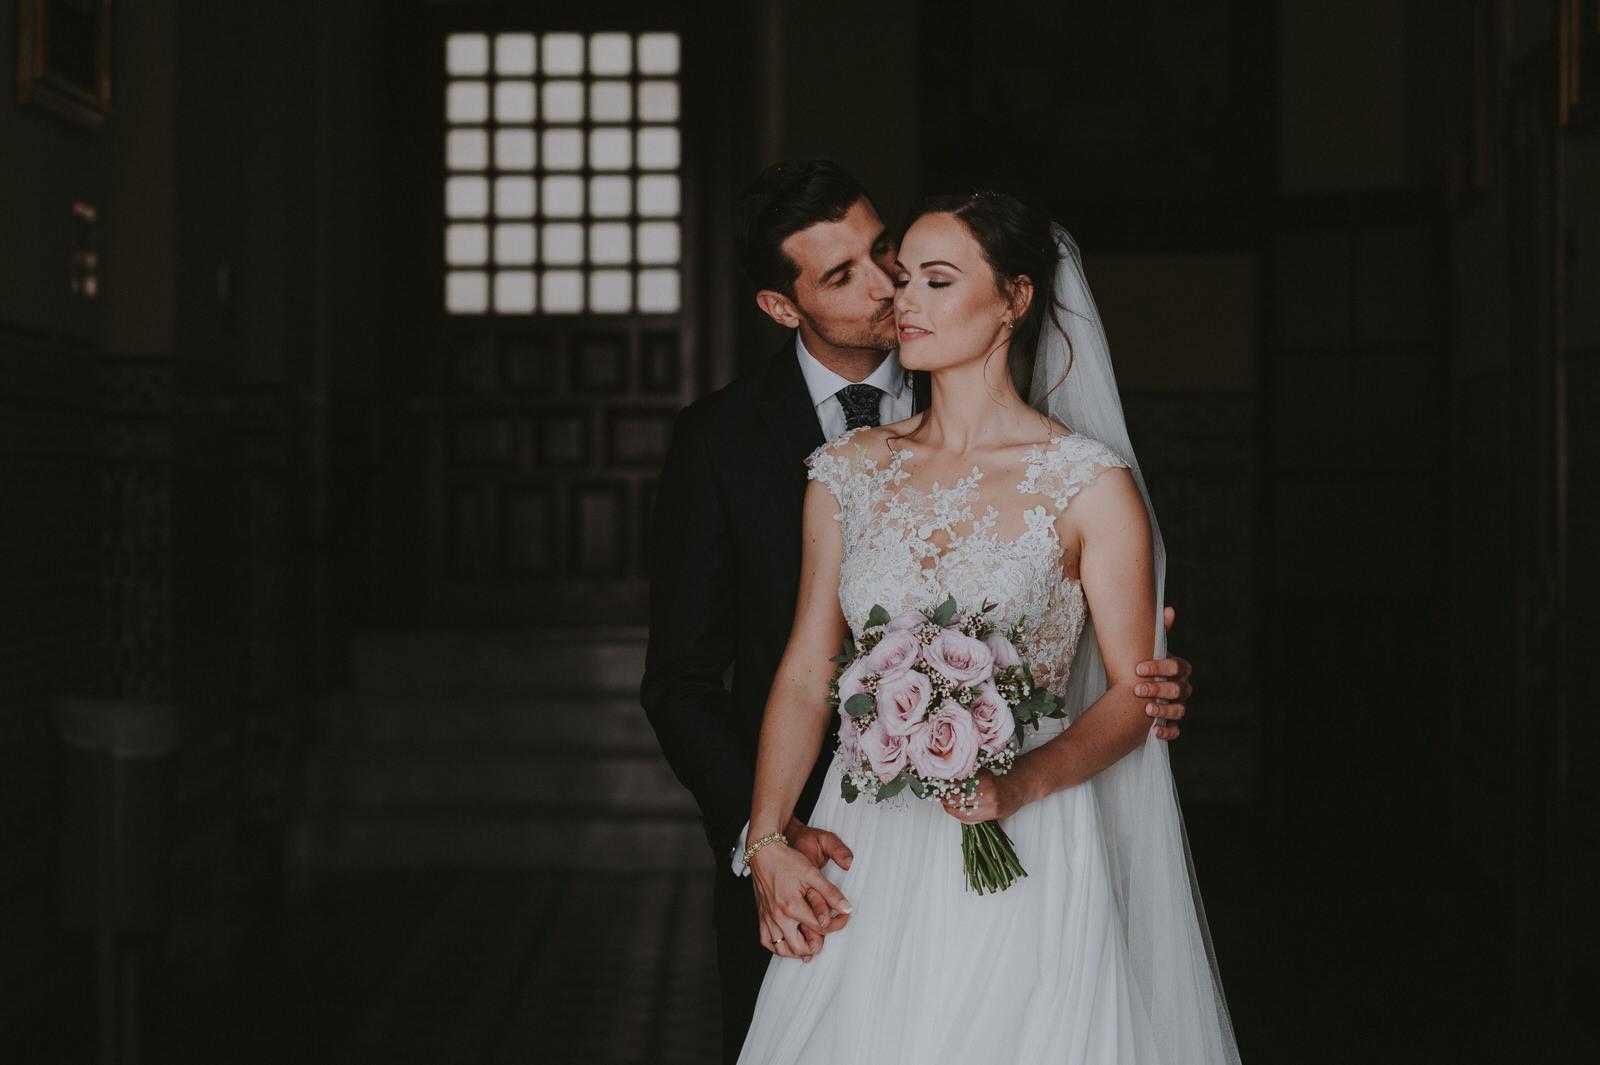 fotografo de boda Utrera - Salesianos Utrera - Andres Amarillo.jpg